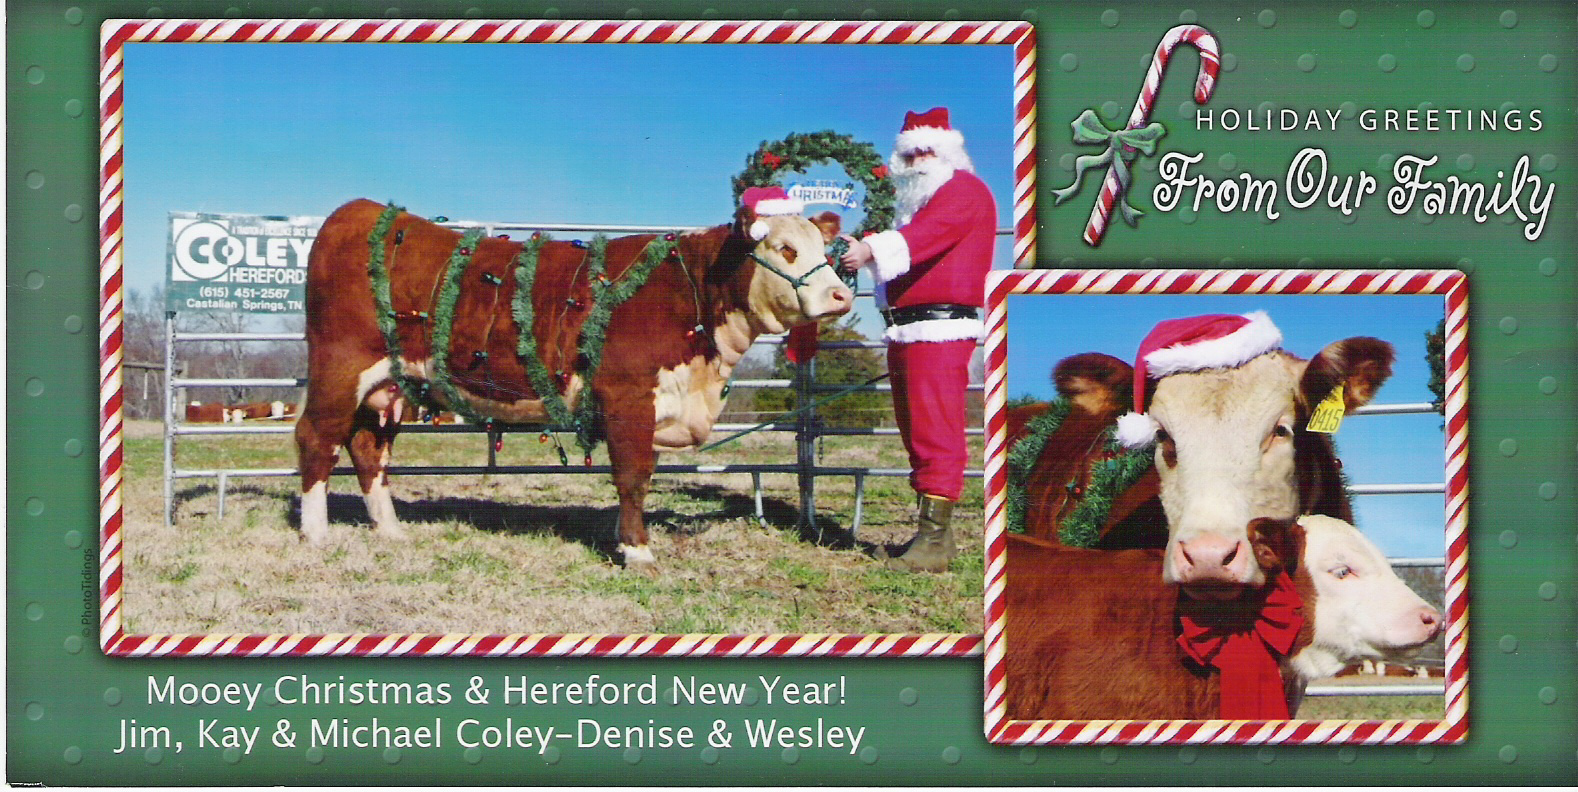 Coley Christmas card 2006